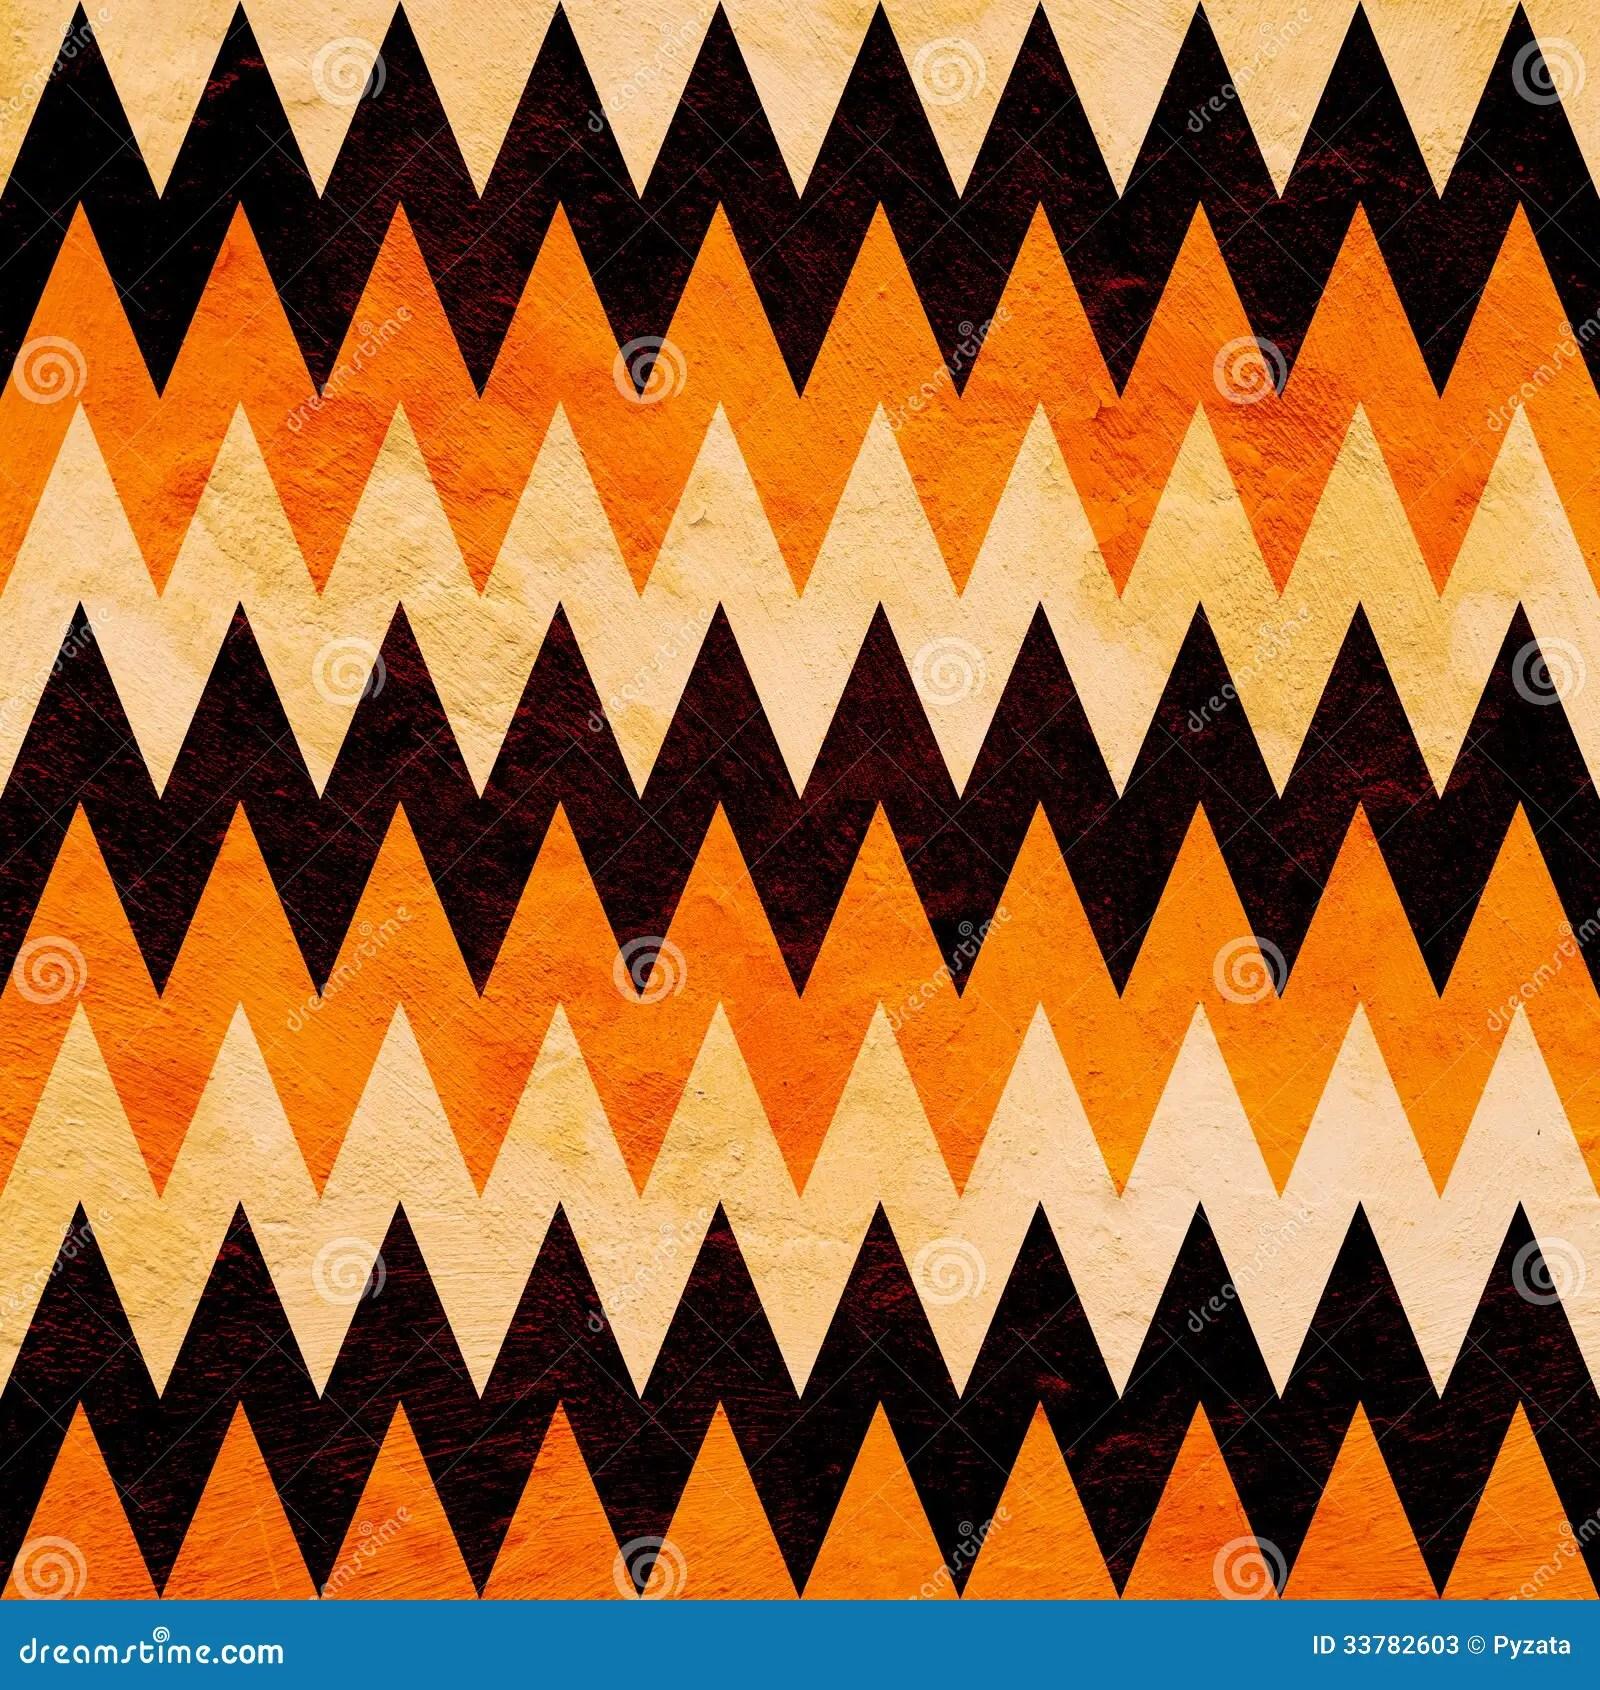 Cute Rustic Fall Wallpapers Halloween Chevron Stock Photos Image 33782603